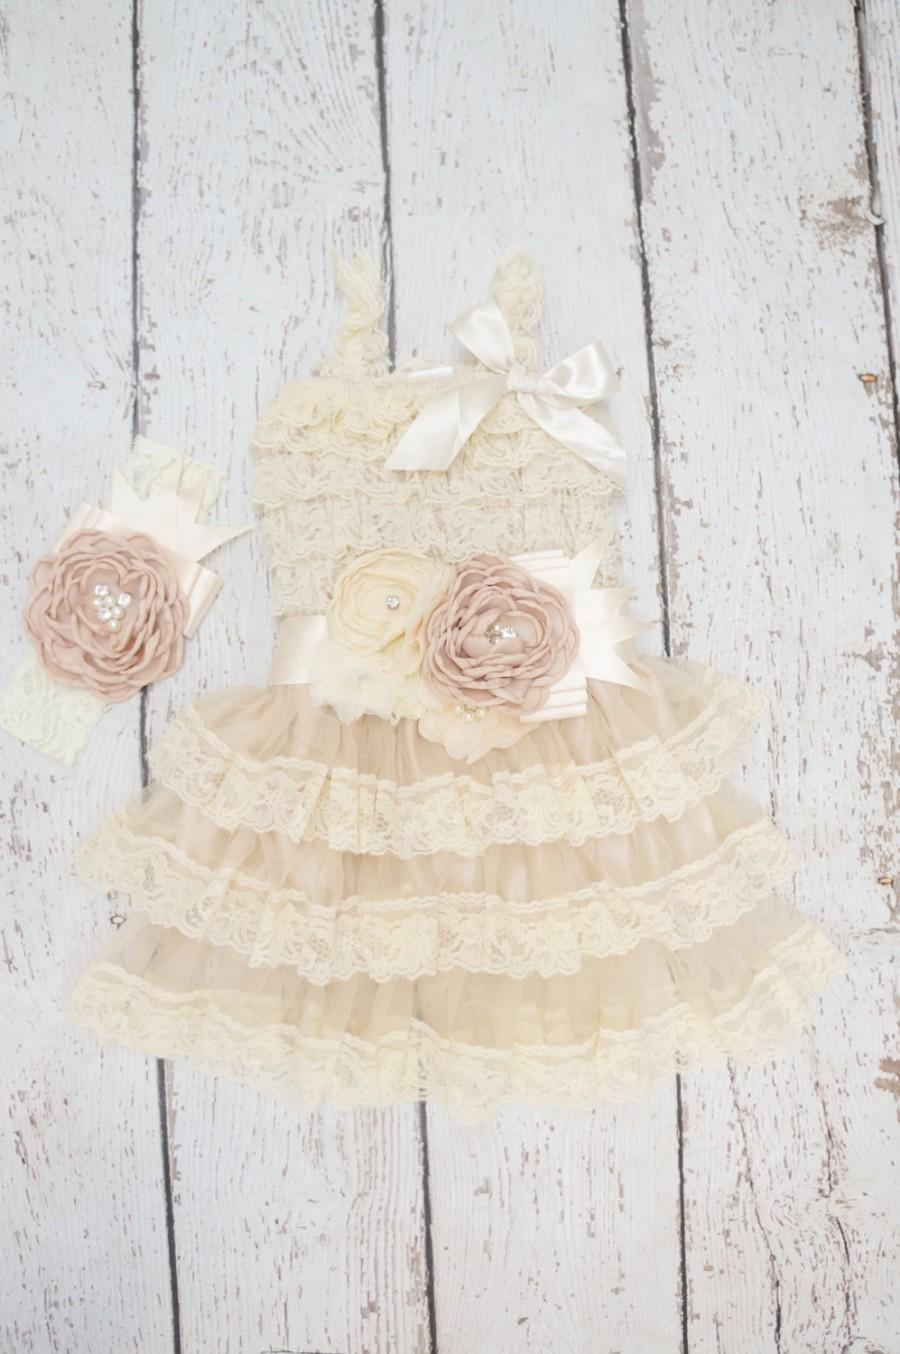 Düğün - lace baby dress, rustic girl dress, flower girl dress, flower girl dresses, lace flower girl dress, country flower girl, champagne dress